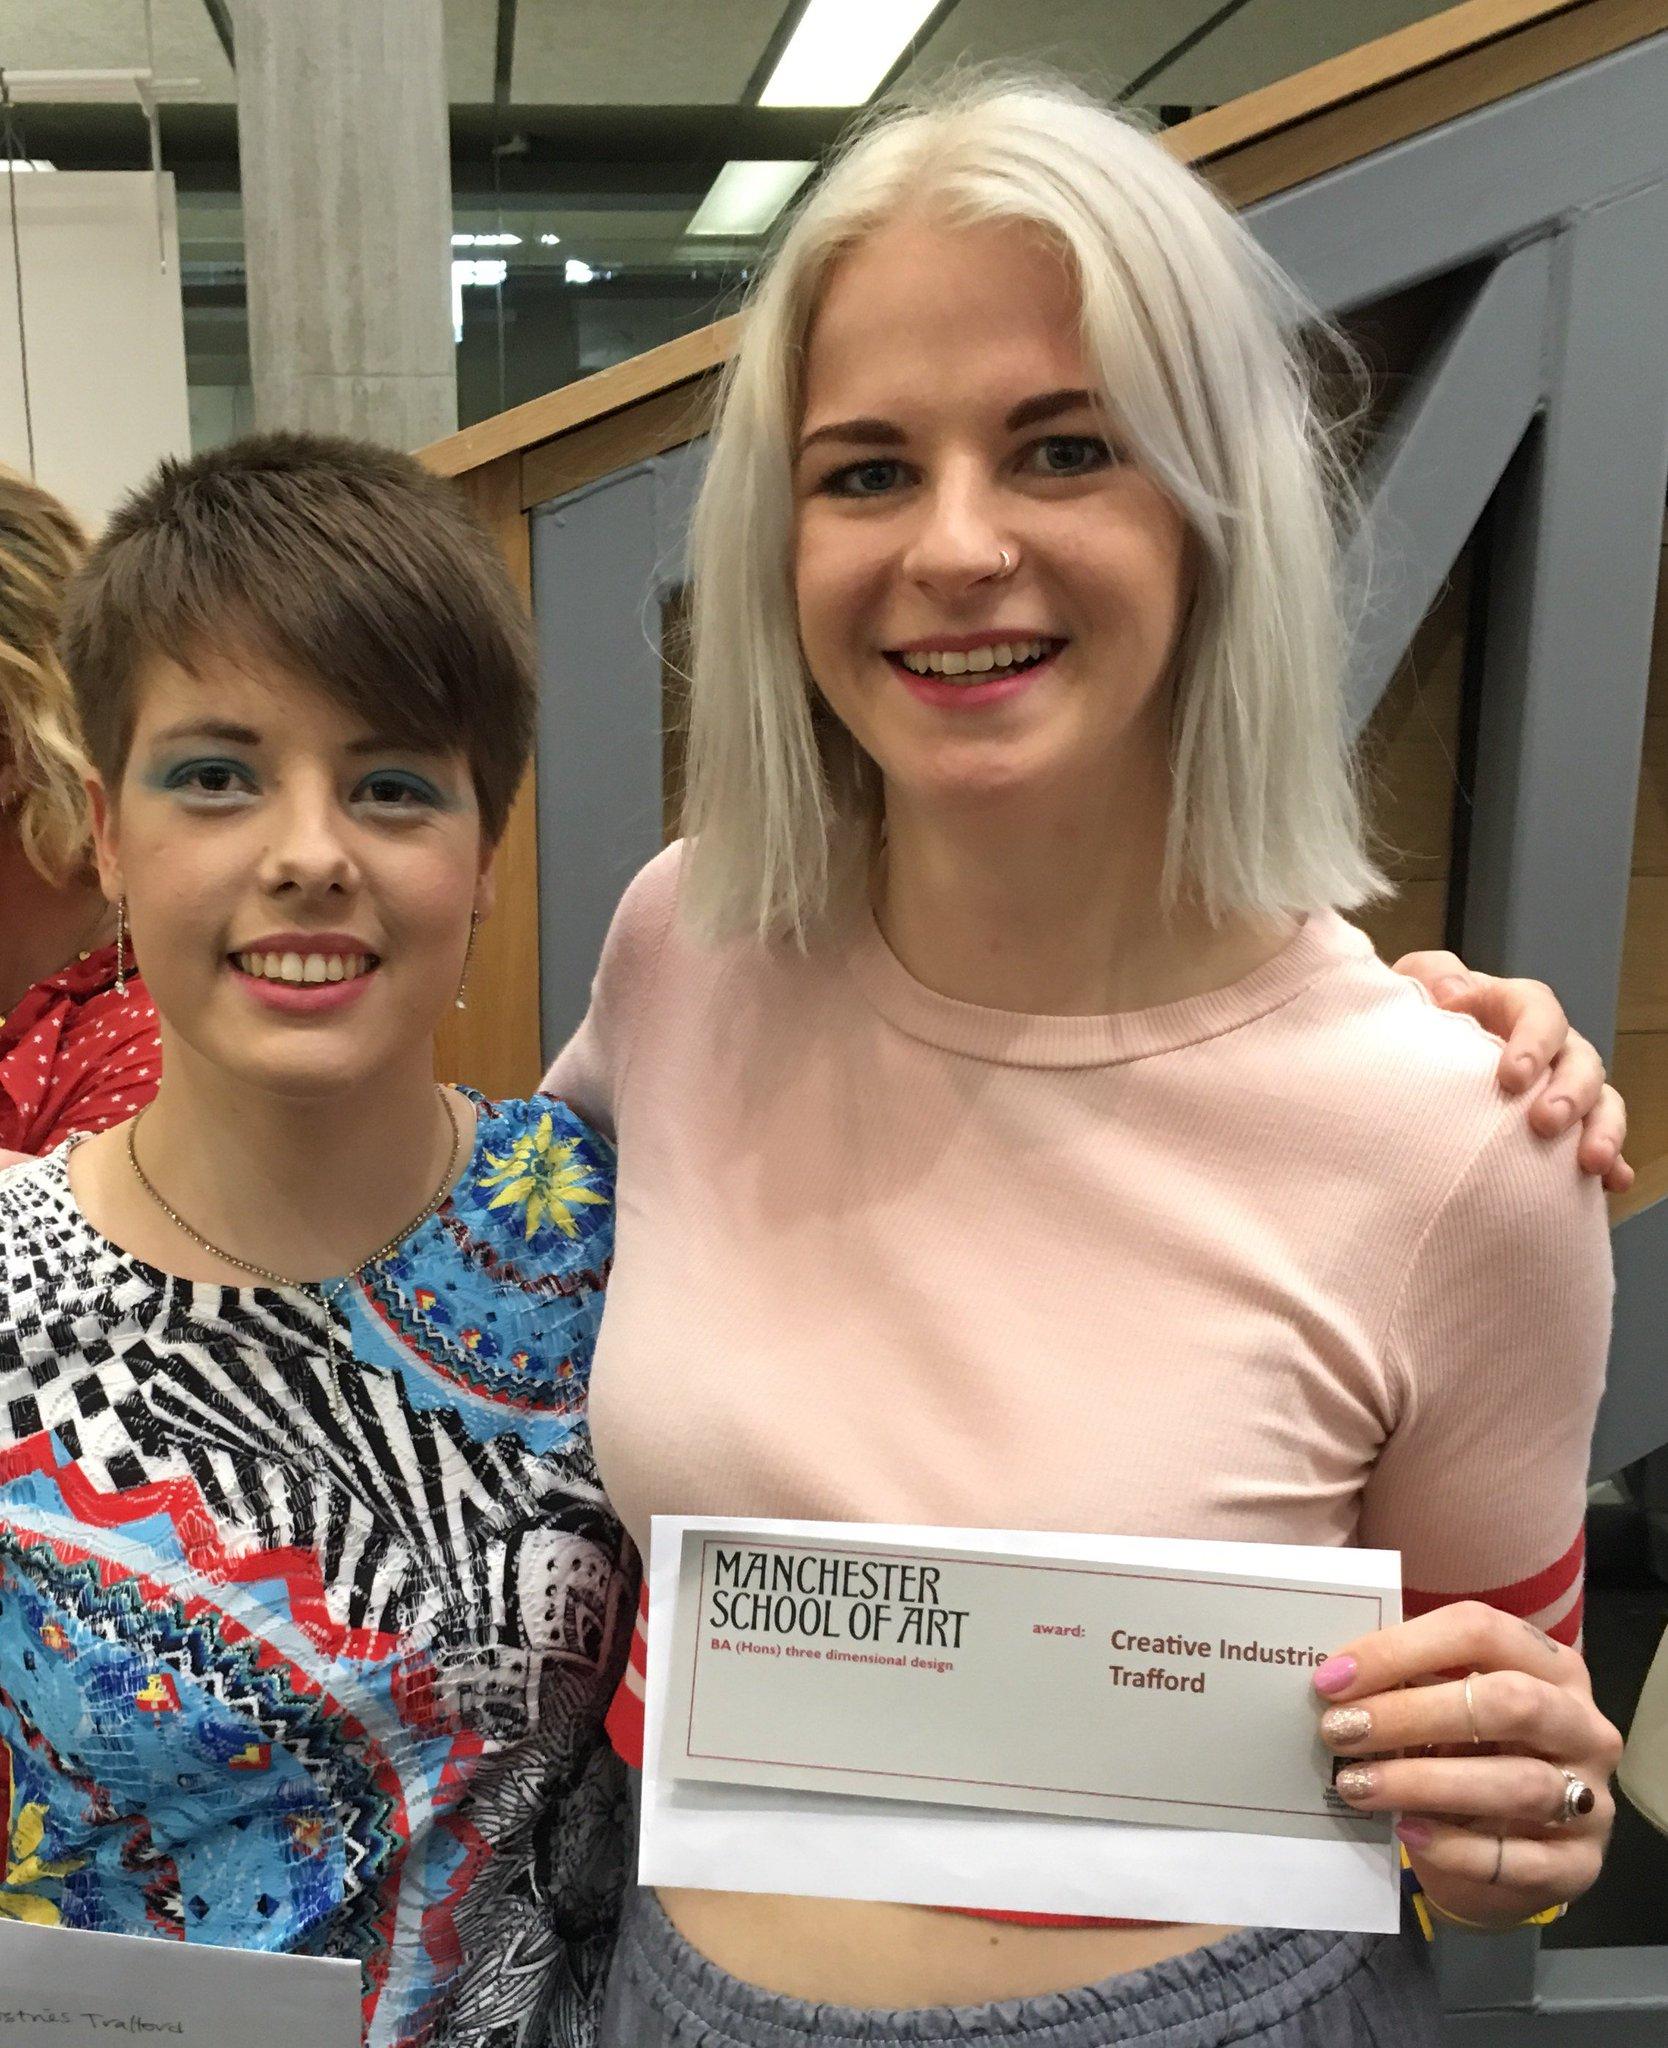 Fab @McrSchArt degree show today - Congrats @KatieNelsonStudio & Grace Leigh Igoe, winners of CIT Mentoring Award #McrDegreeShow17 https://t.co/dkGme9M7cU